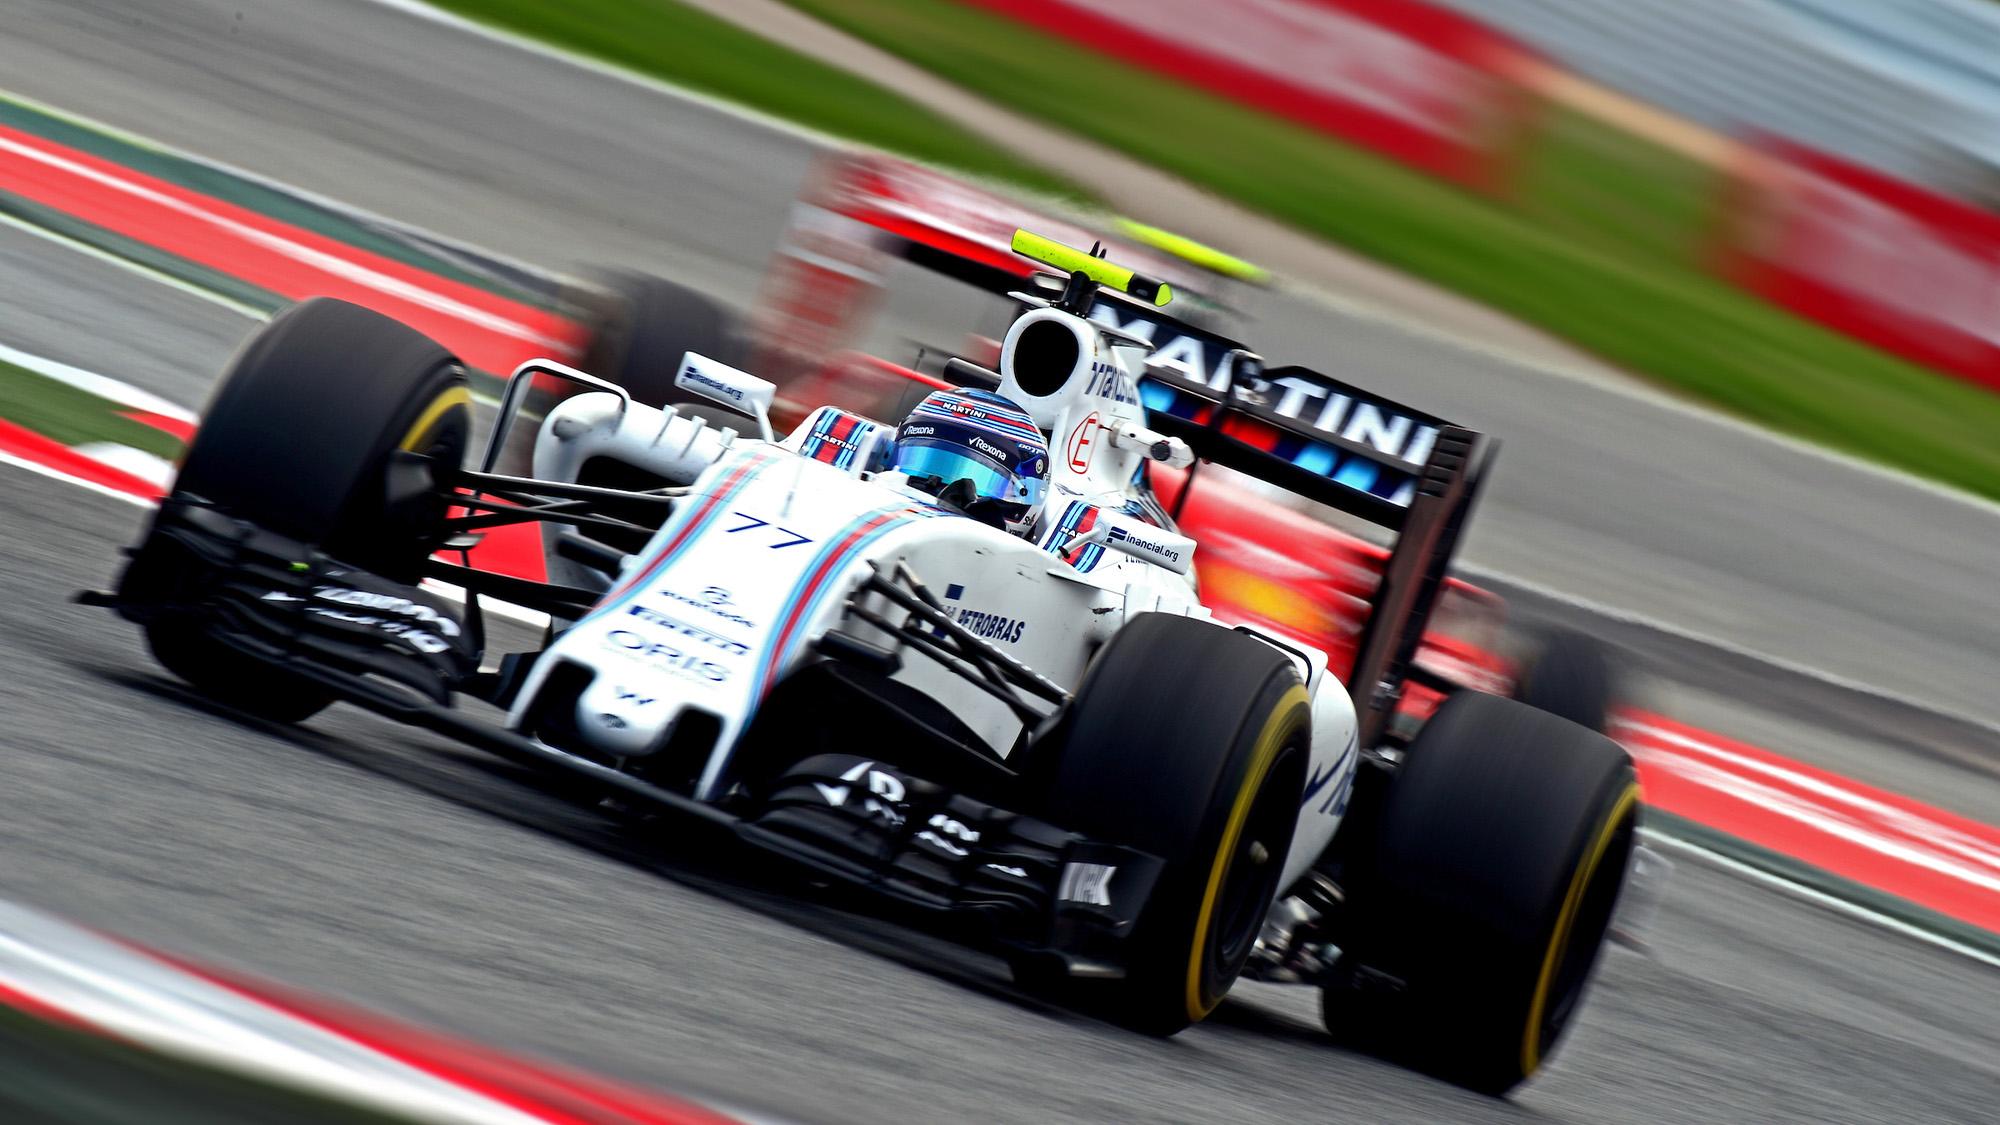 Williams of Valtteri Bottas at the 2016 Spanish GP